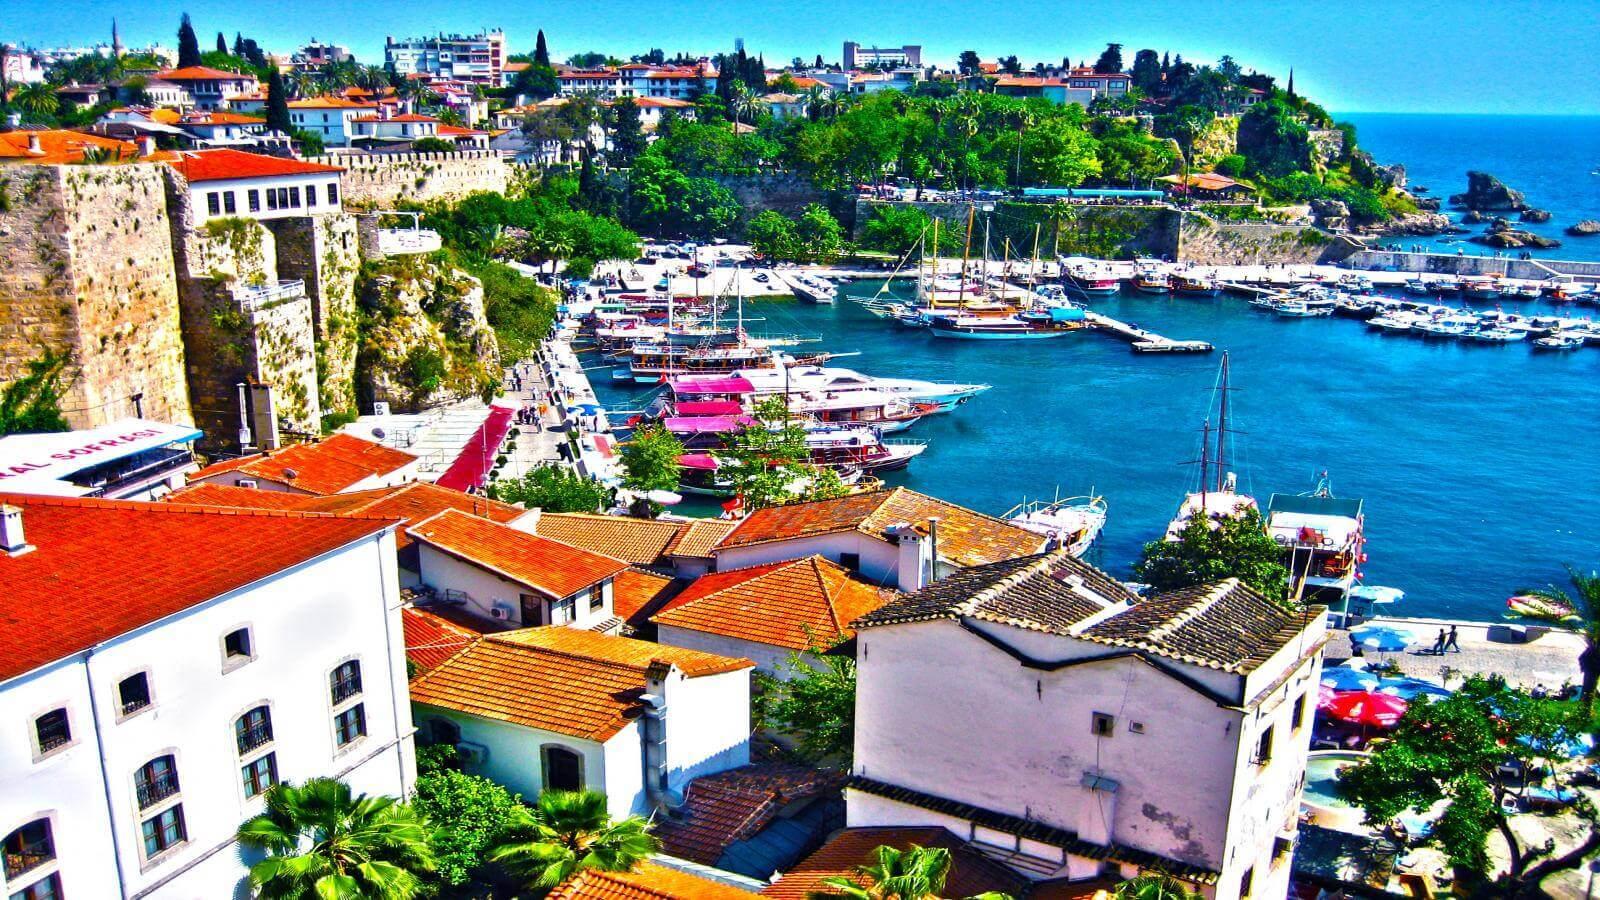 Antalya Turkey travel - ავიაბილეთები ანტალია